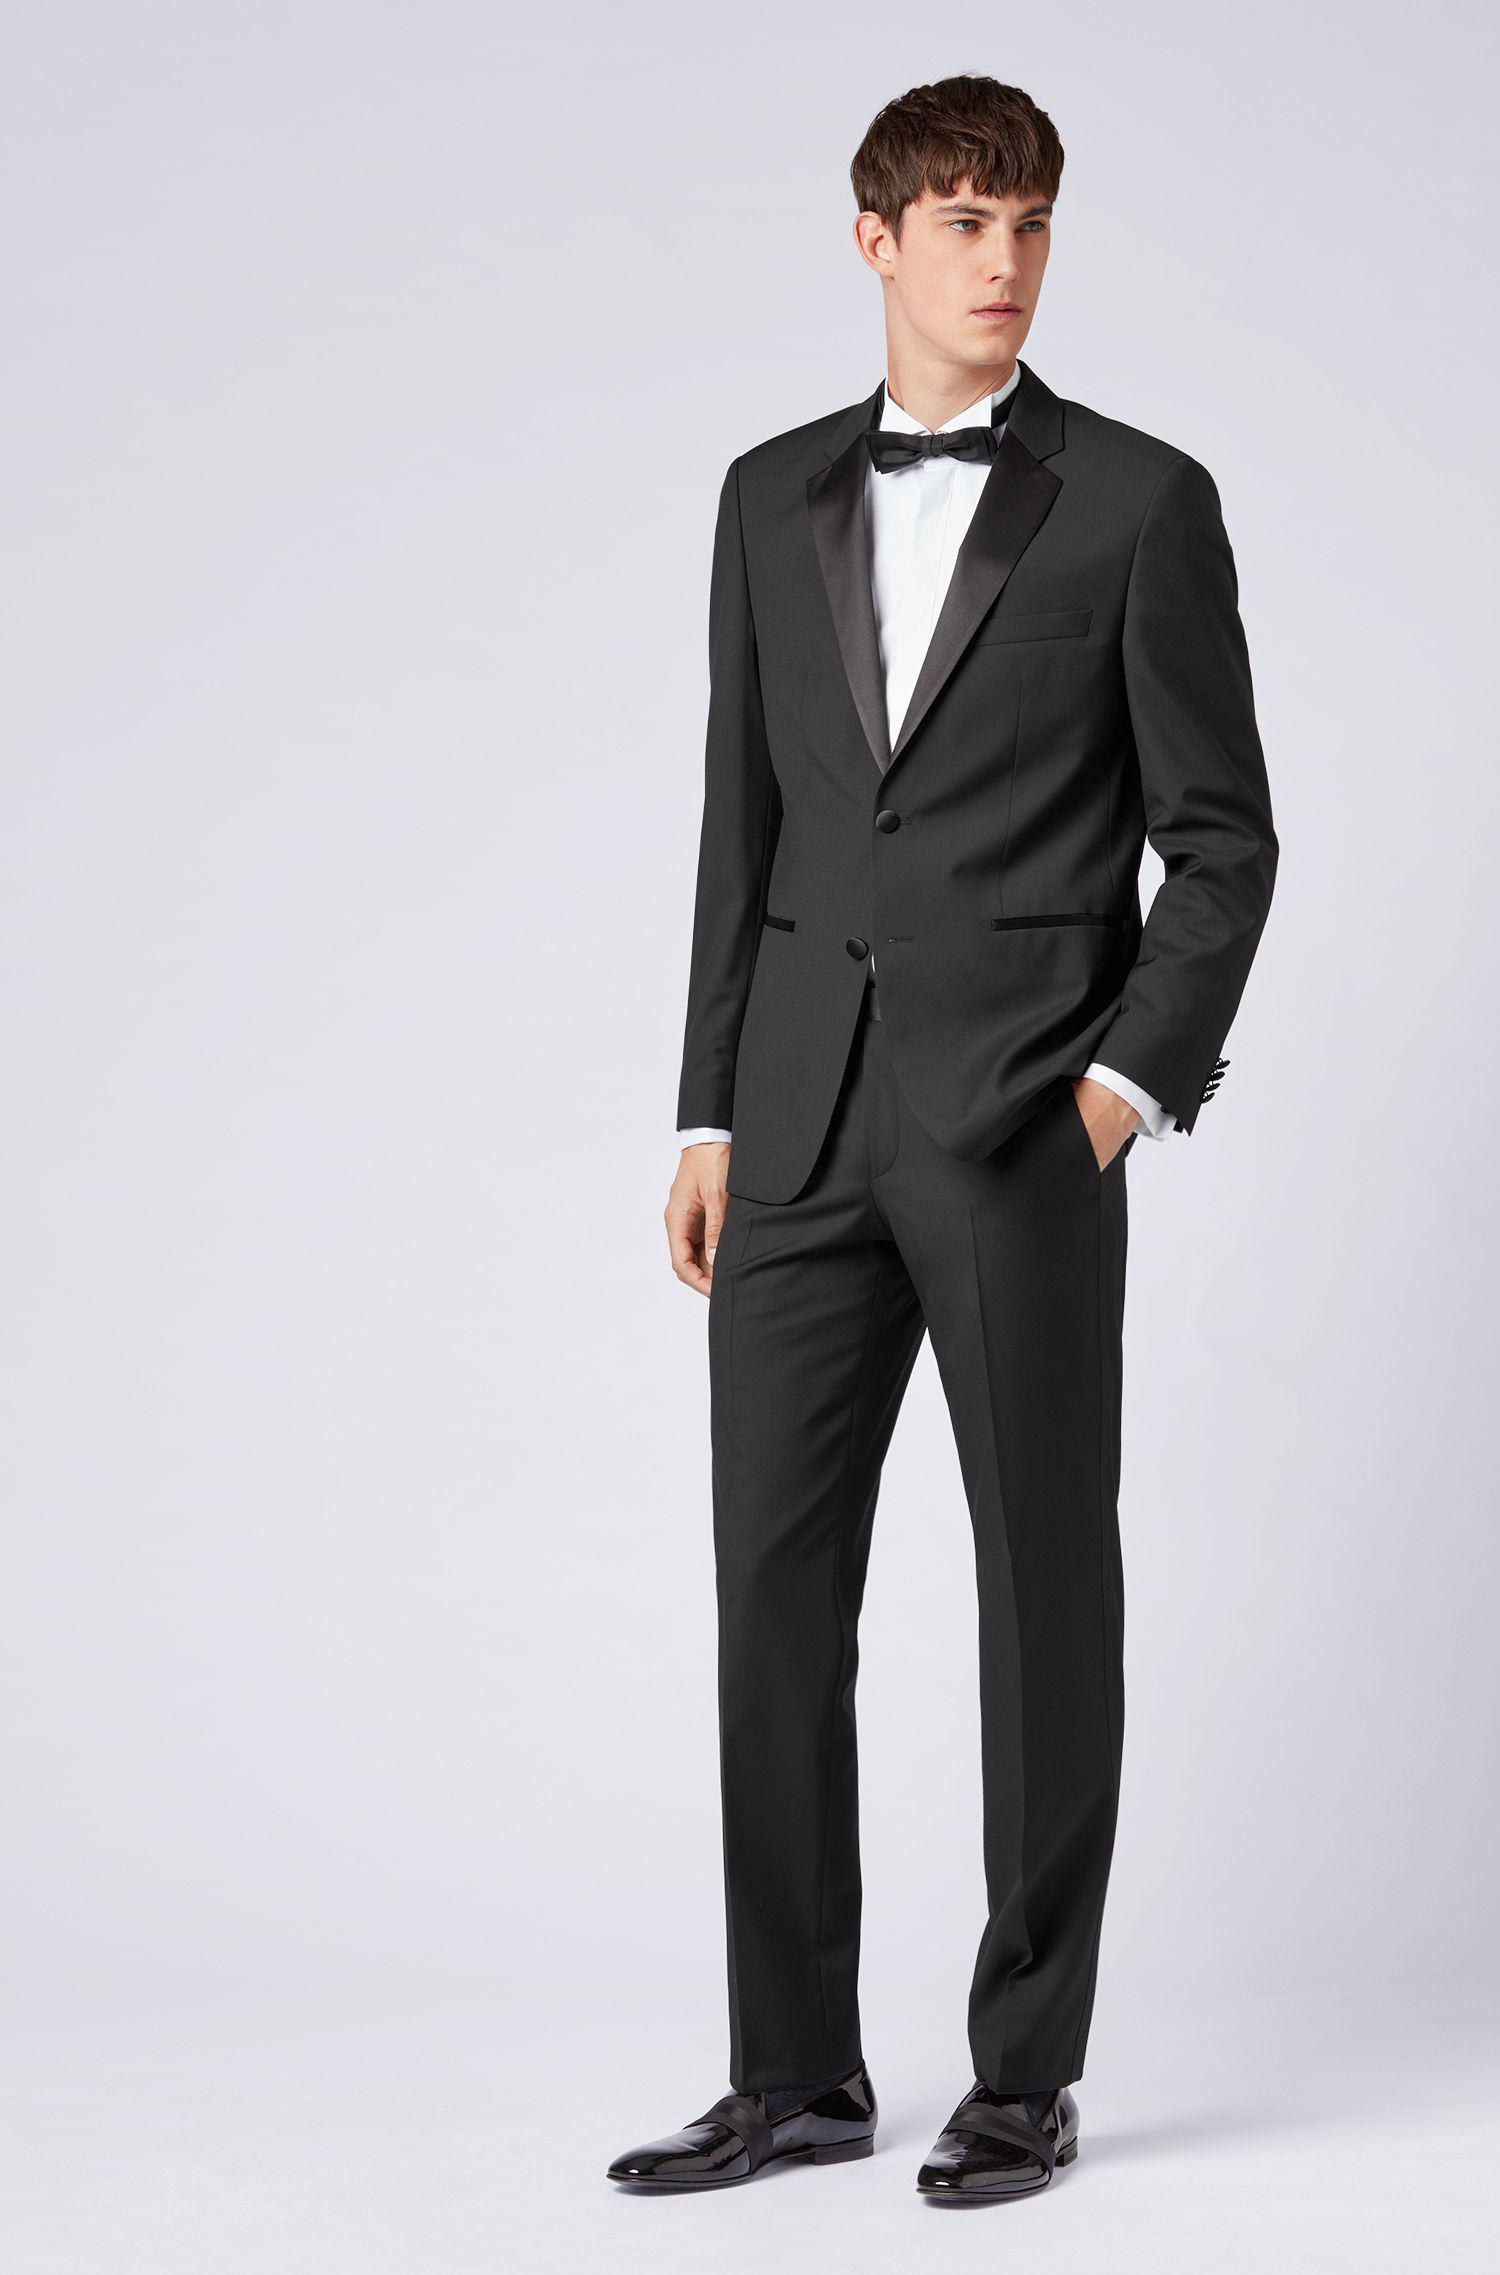 ffd5612d Hugo Boss Slim Fit Dress Shirt White - DREAMWORKS